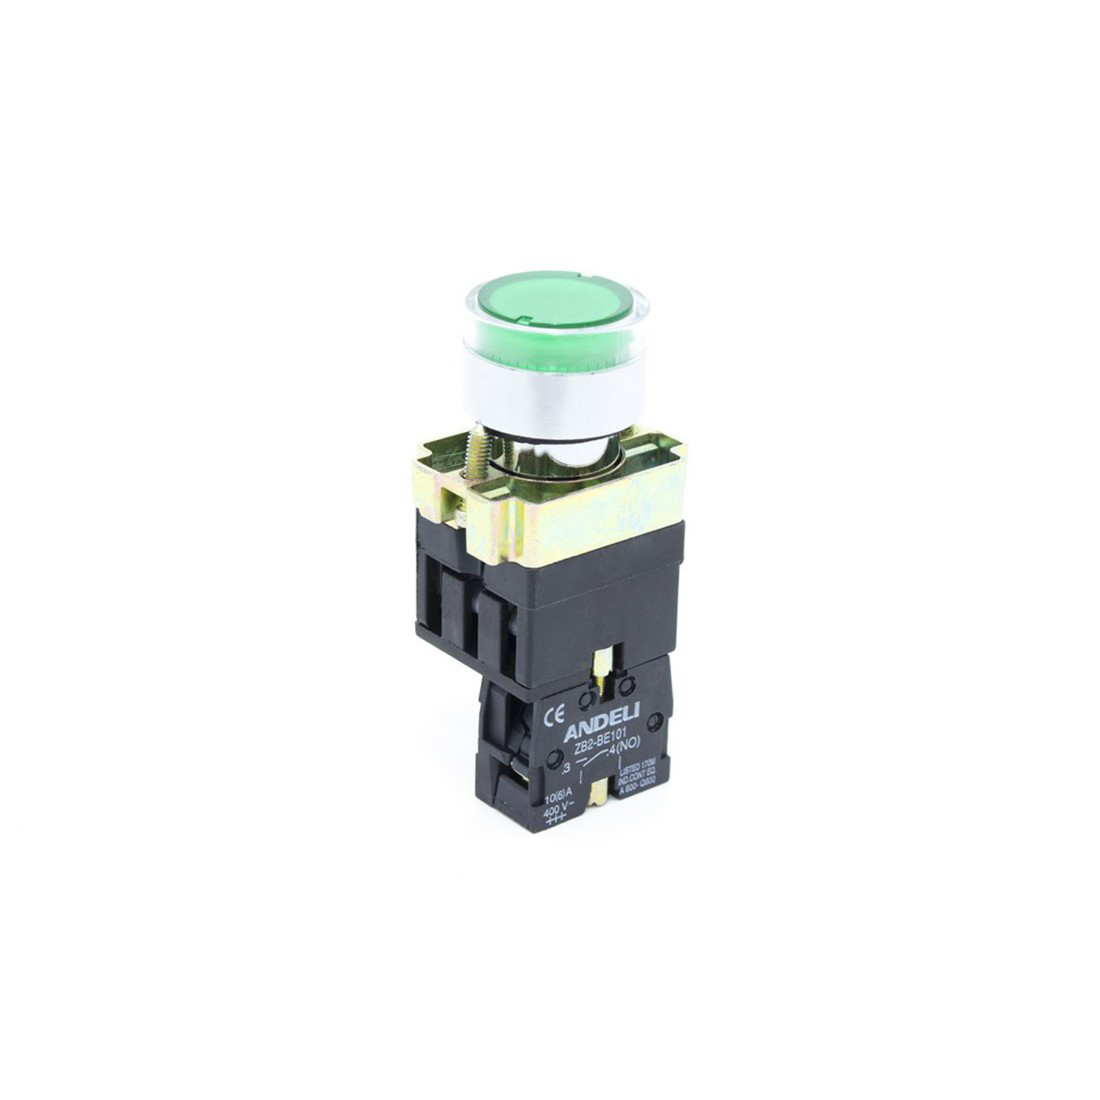 Кнопка открытая ANDELI XB2-BW3371 (зелёная с подсветкой)